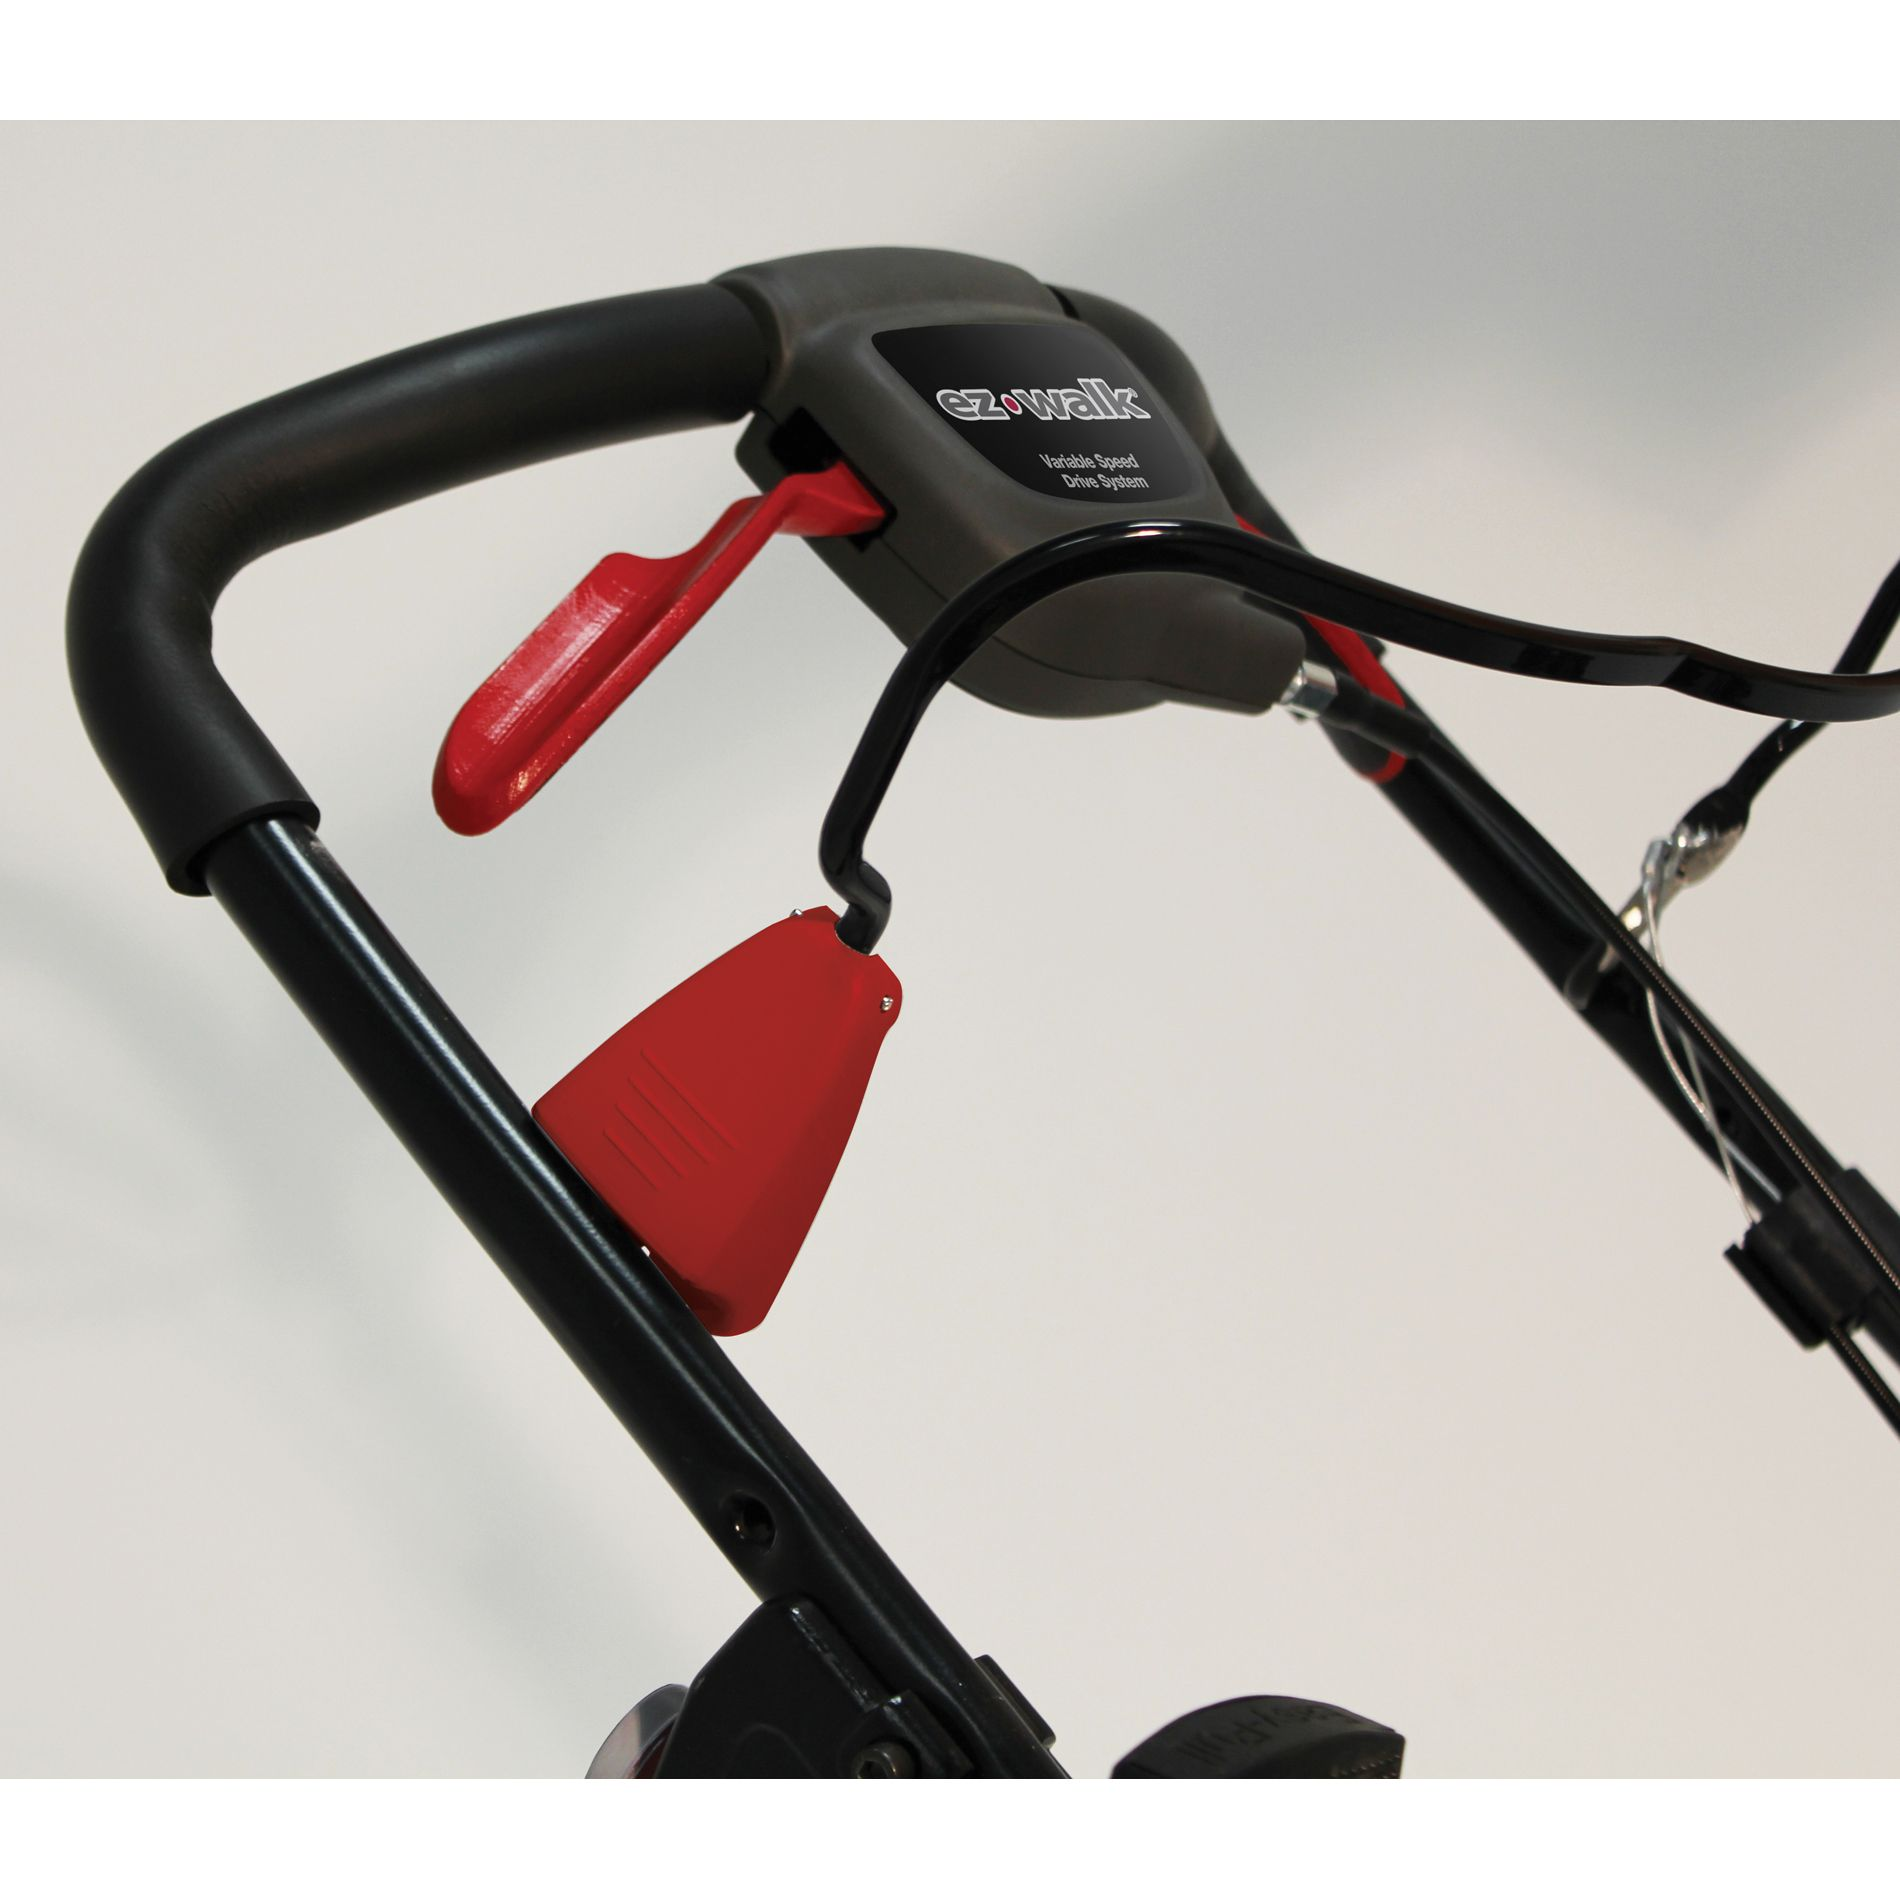 "Craftsman 190cc* 22"" Rear Drive Self-Propelled EZ Lawn Mower 50 States"